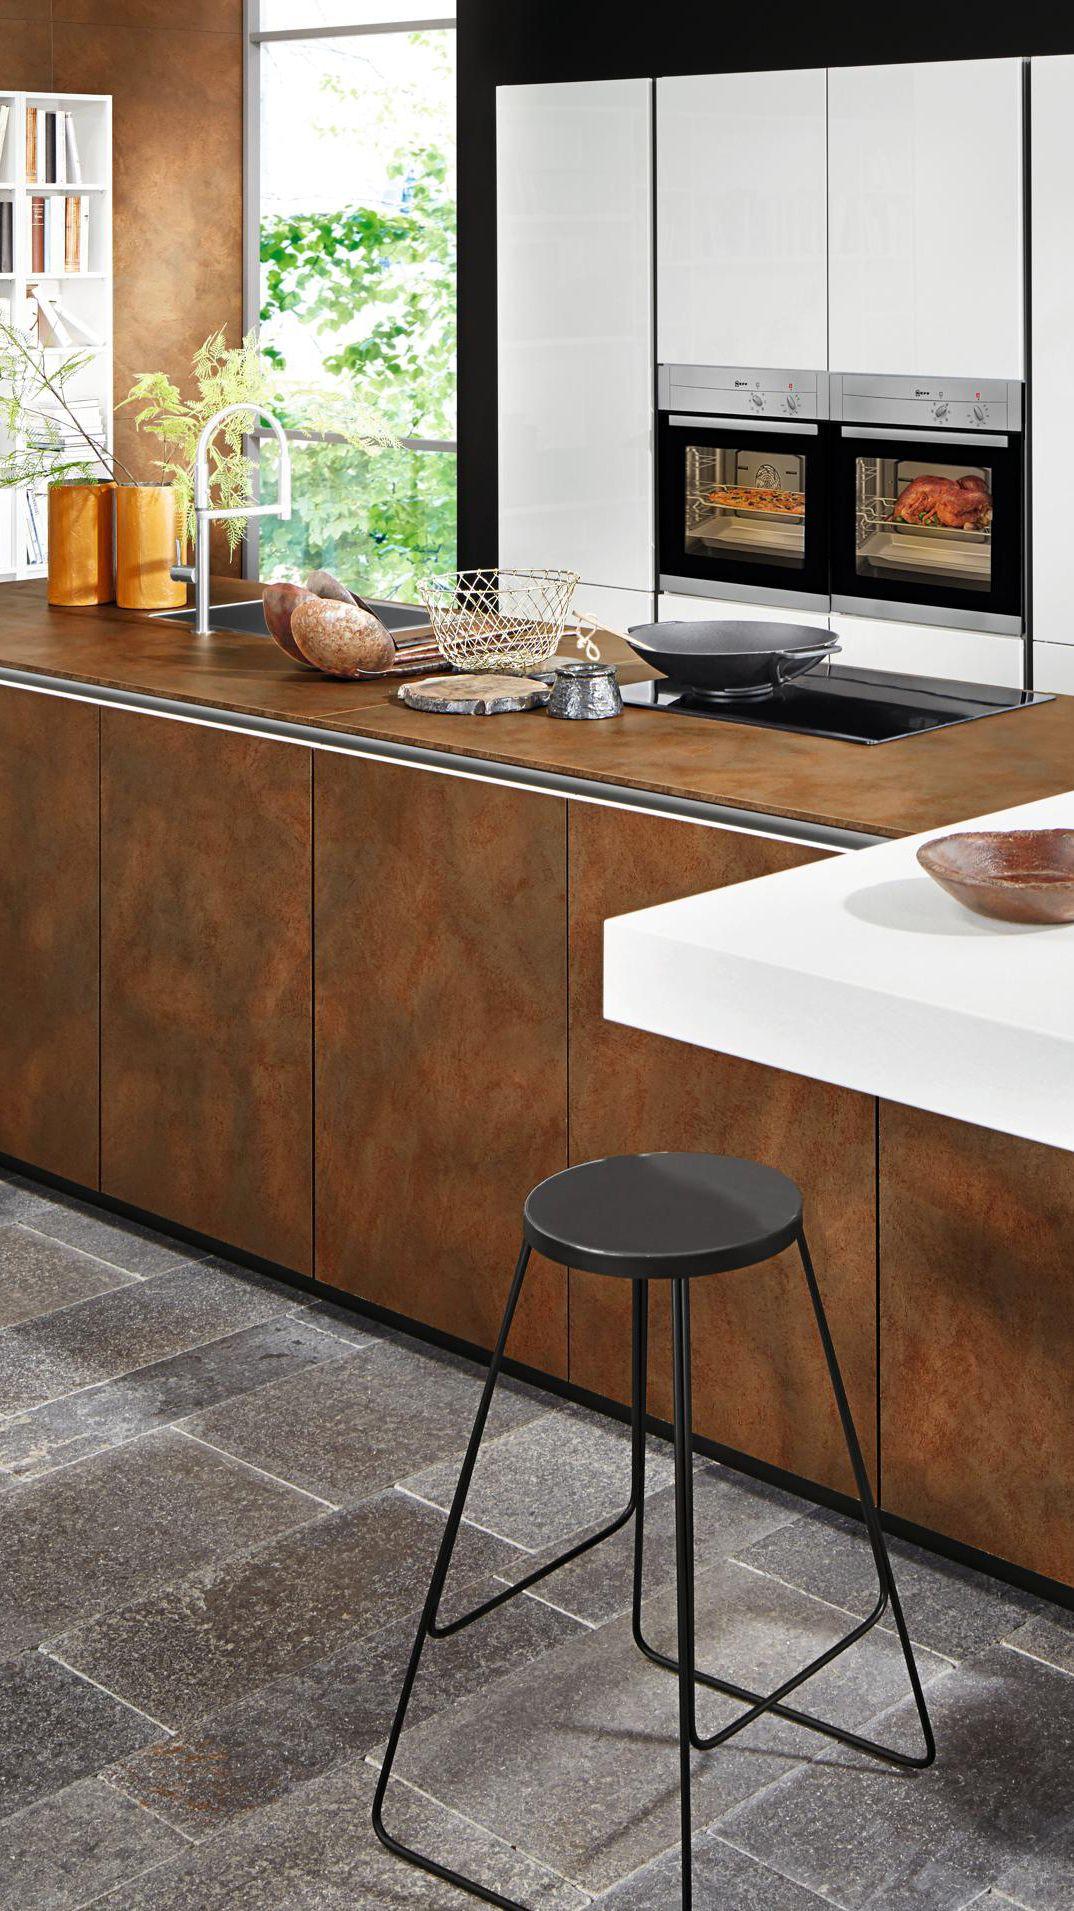 Full Size of Komplettküche Billig Respekta Küche Küchenzeile Küchenblock Einbauküche Komplettküche Weiß 320 Cm Einbauküche Ohne Kühlschrank Willhaben Komplettküche Küche Einbauküche Ohne Kühlschrank